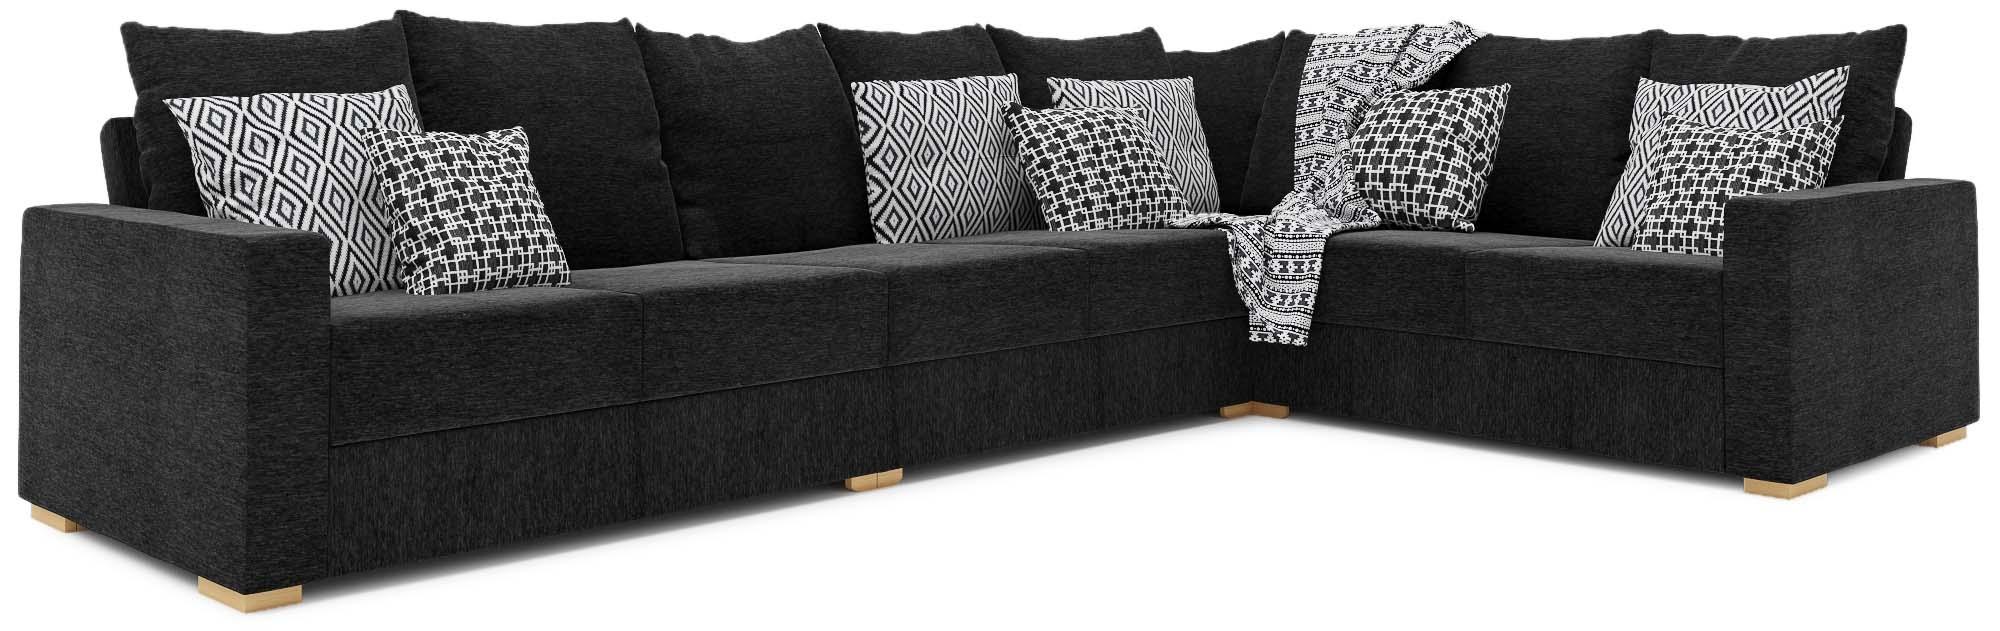 Tor 5X3 Corner Single Sofa Bed